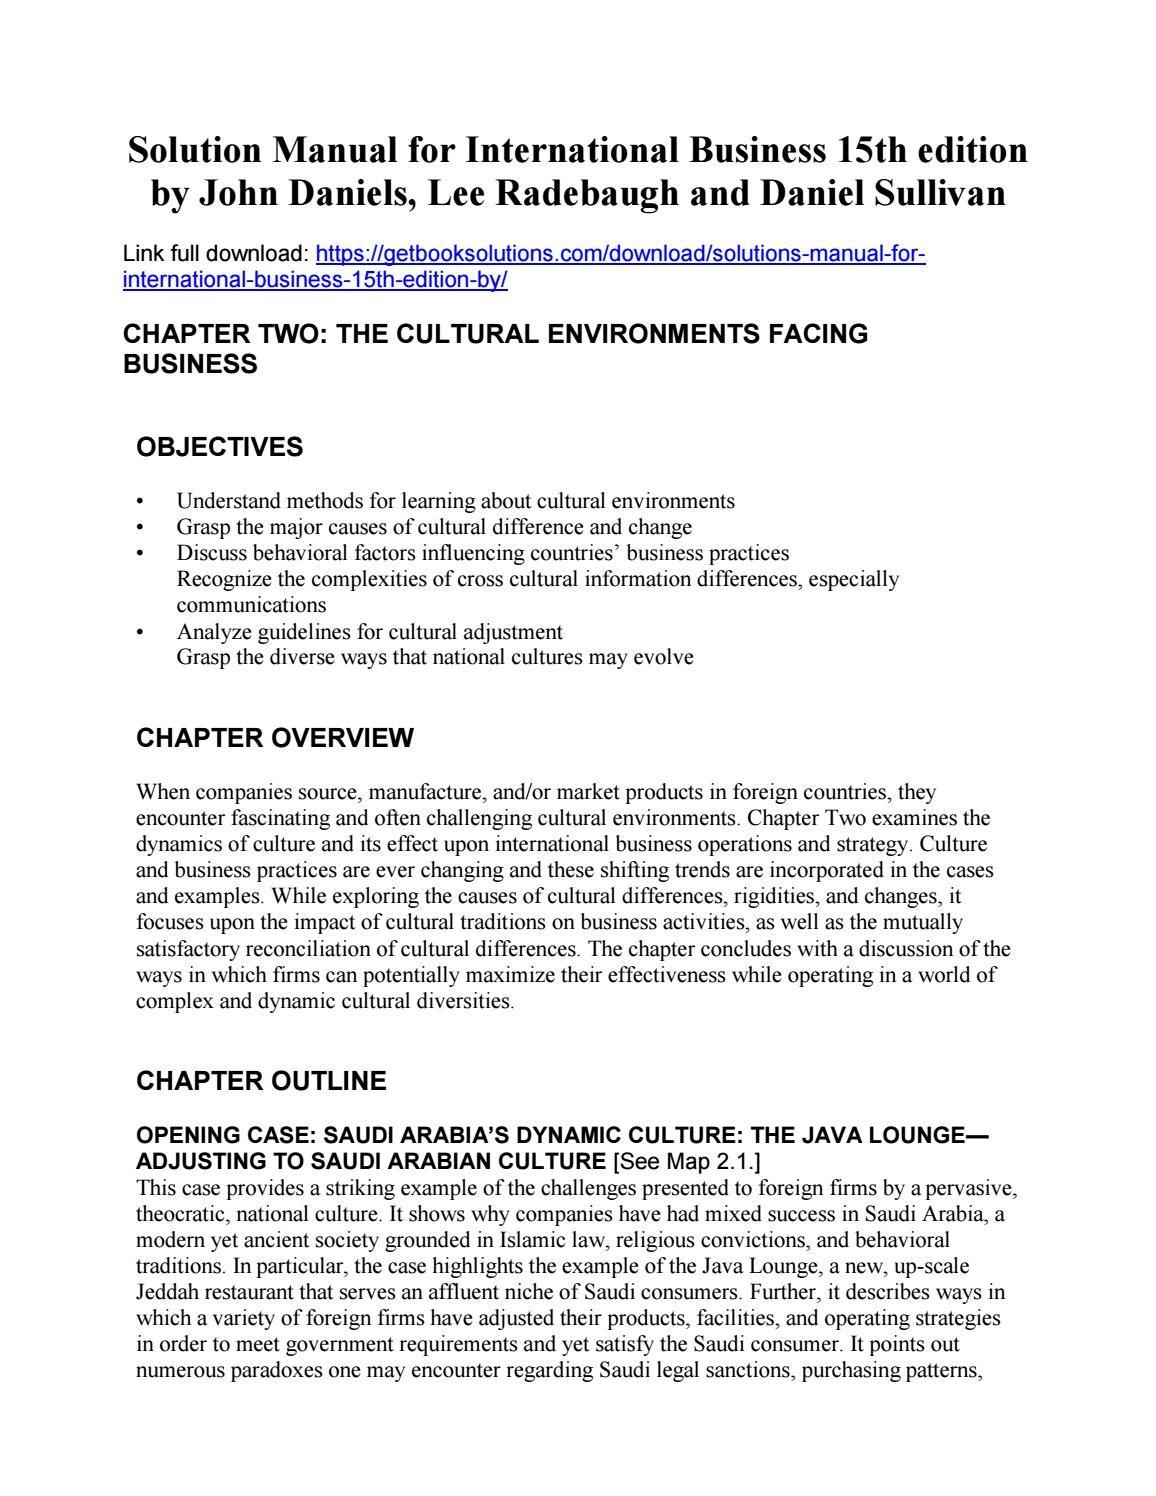 solutions manual international business 15th edition daniels rh pinterest com biochemical engineering james lee solution manual pdf james lee solution manual